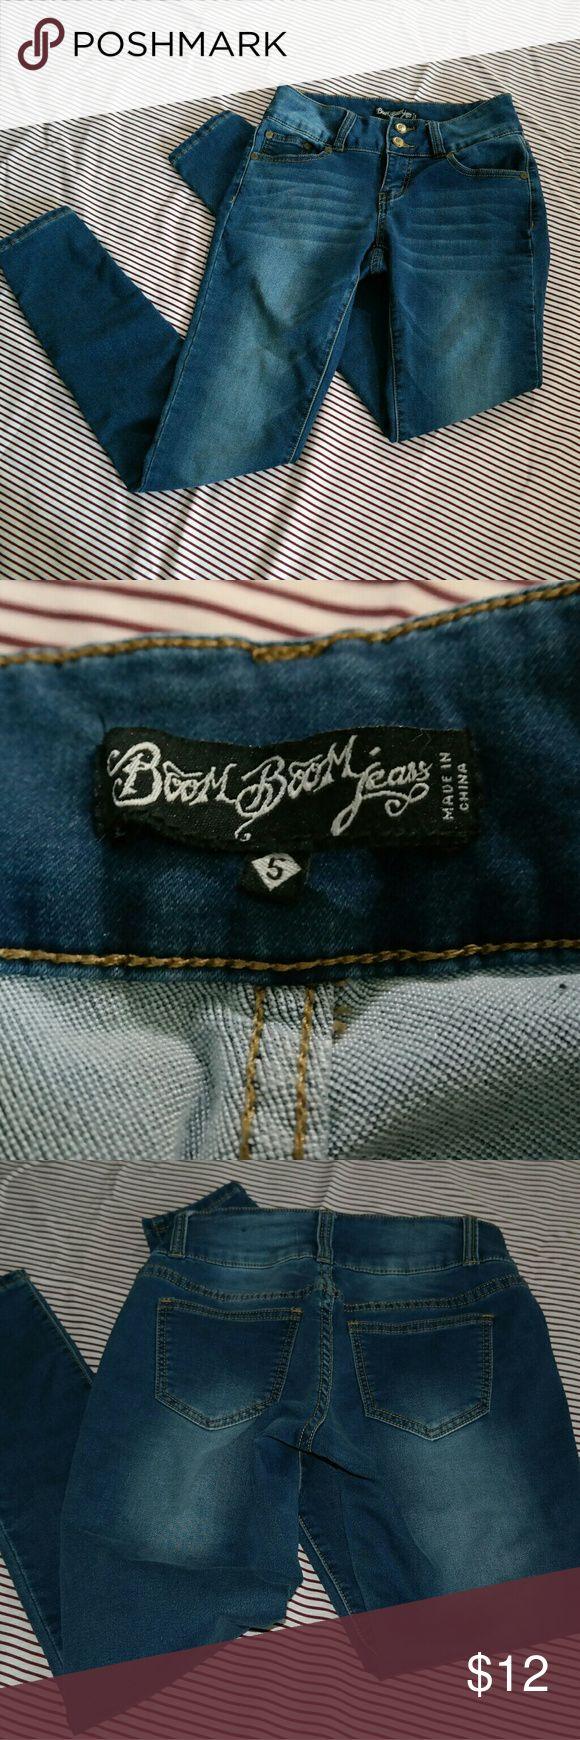 Boom Boom Jeans - Skinny, Curve Hugging Jeans Like new, mild wash skinny jeans. Boom Boom Jeans Jeans Skinny